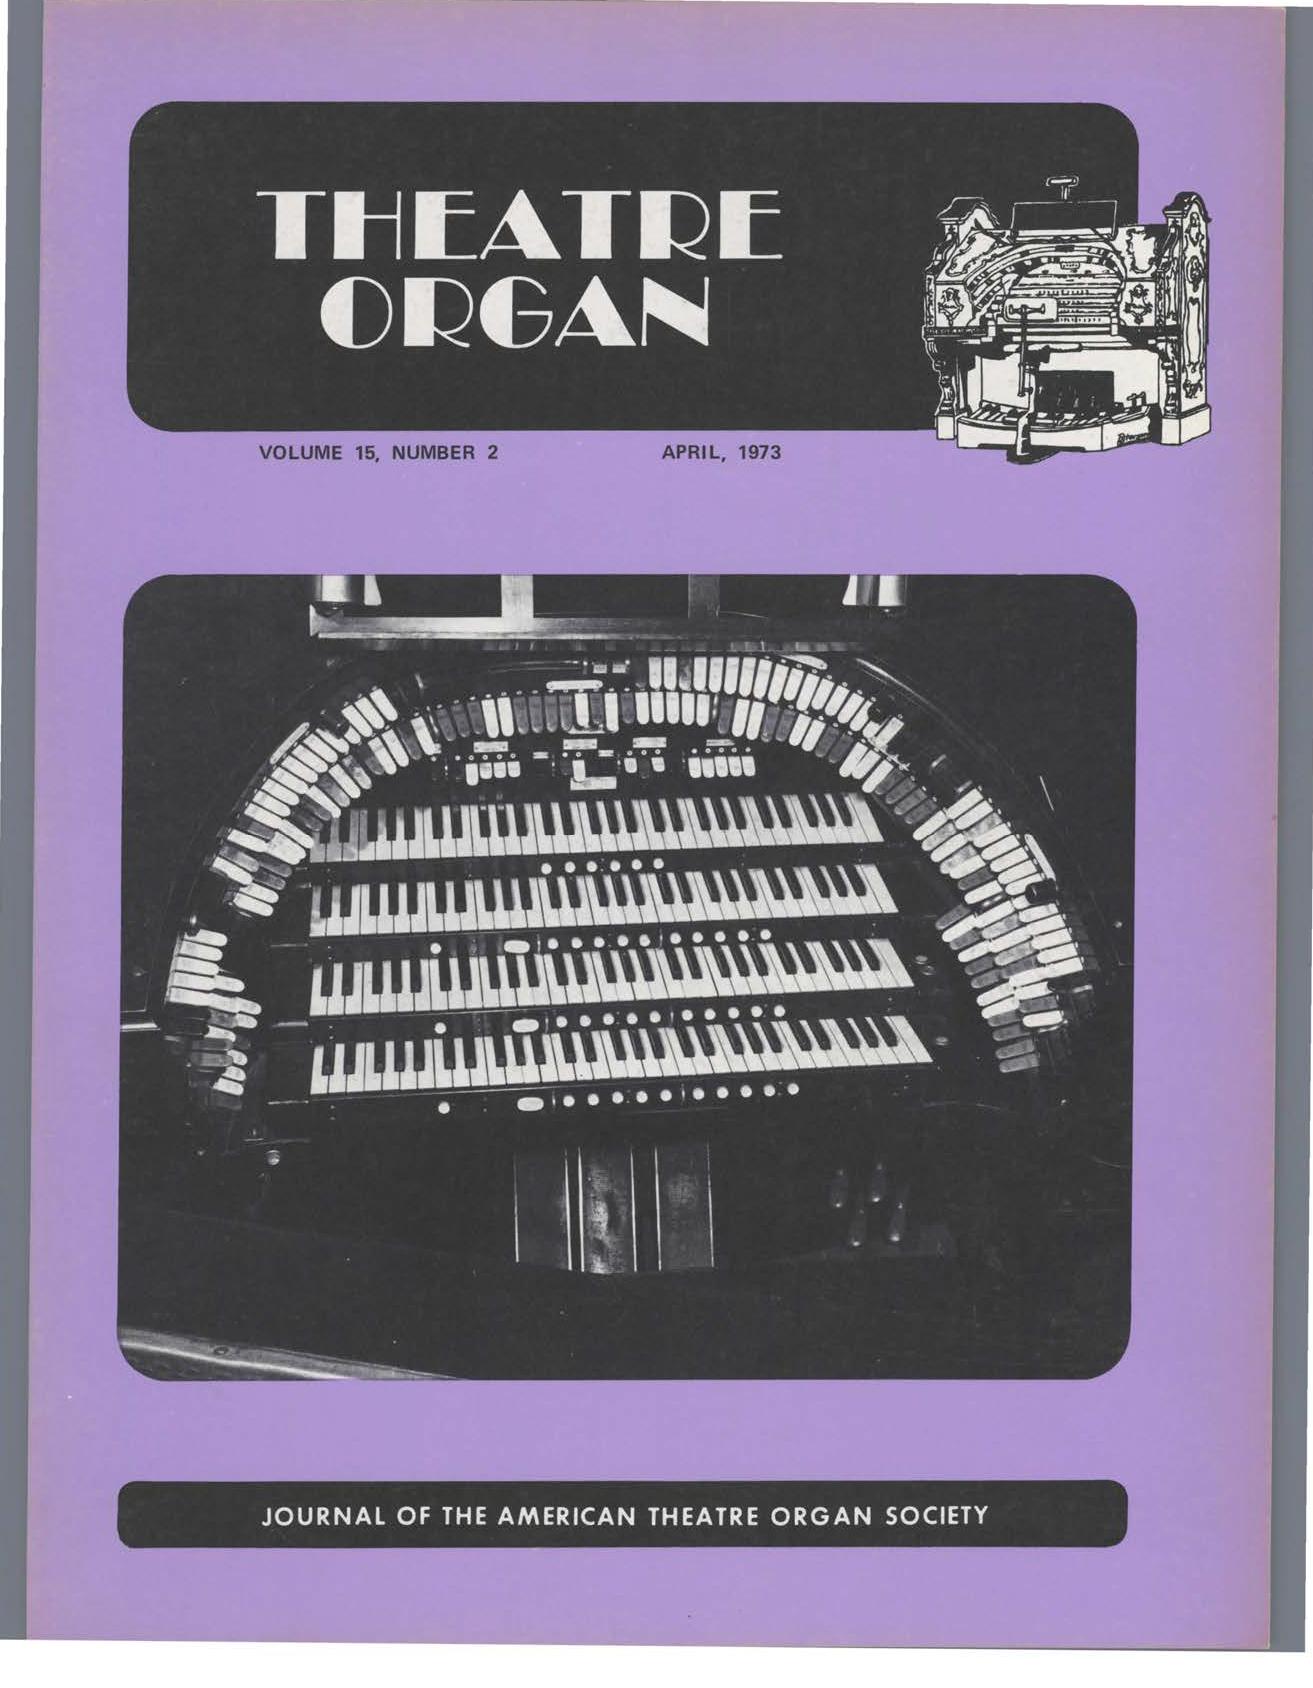 Theatre Organ, April 1973, Volume 15, Number 2